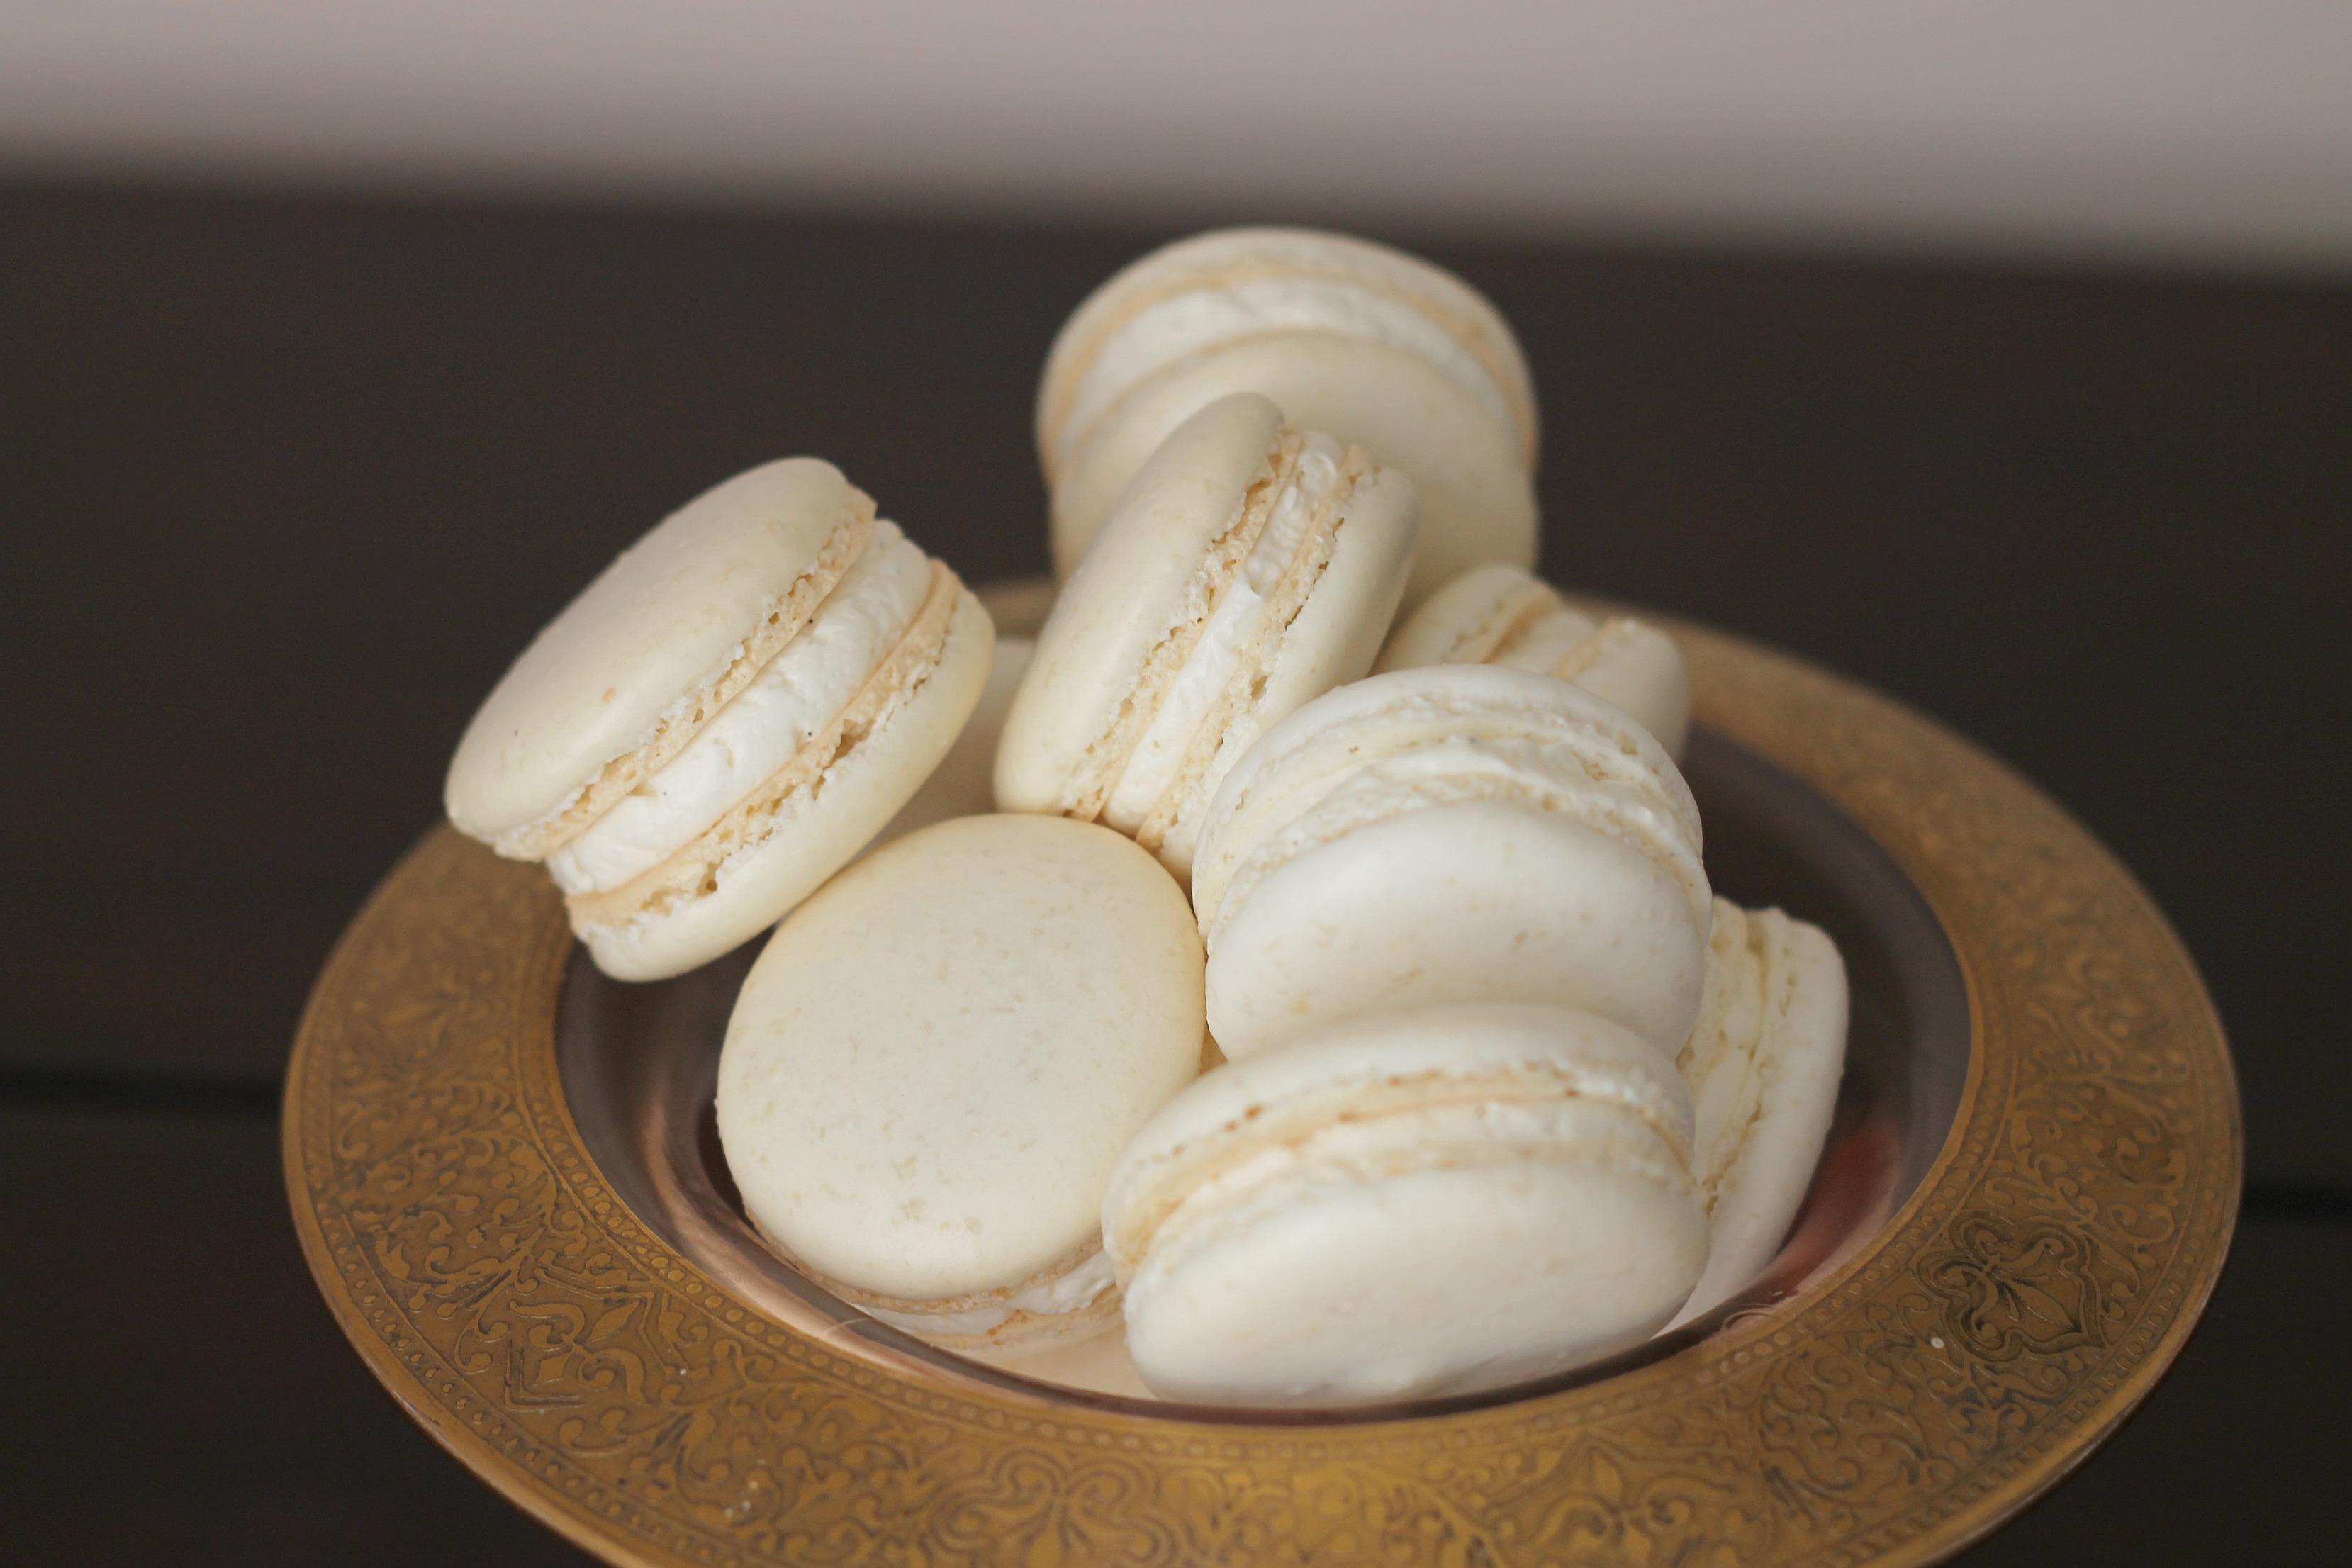 Swiss meringue macaron